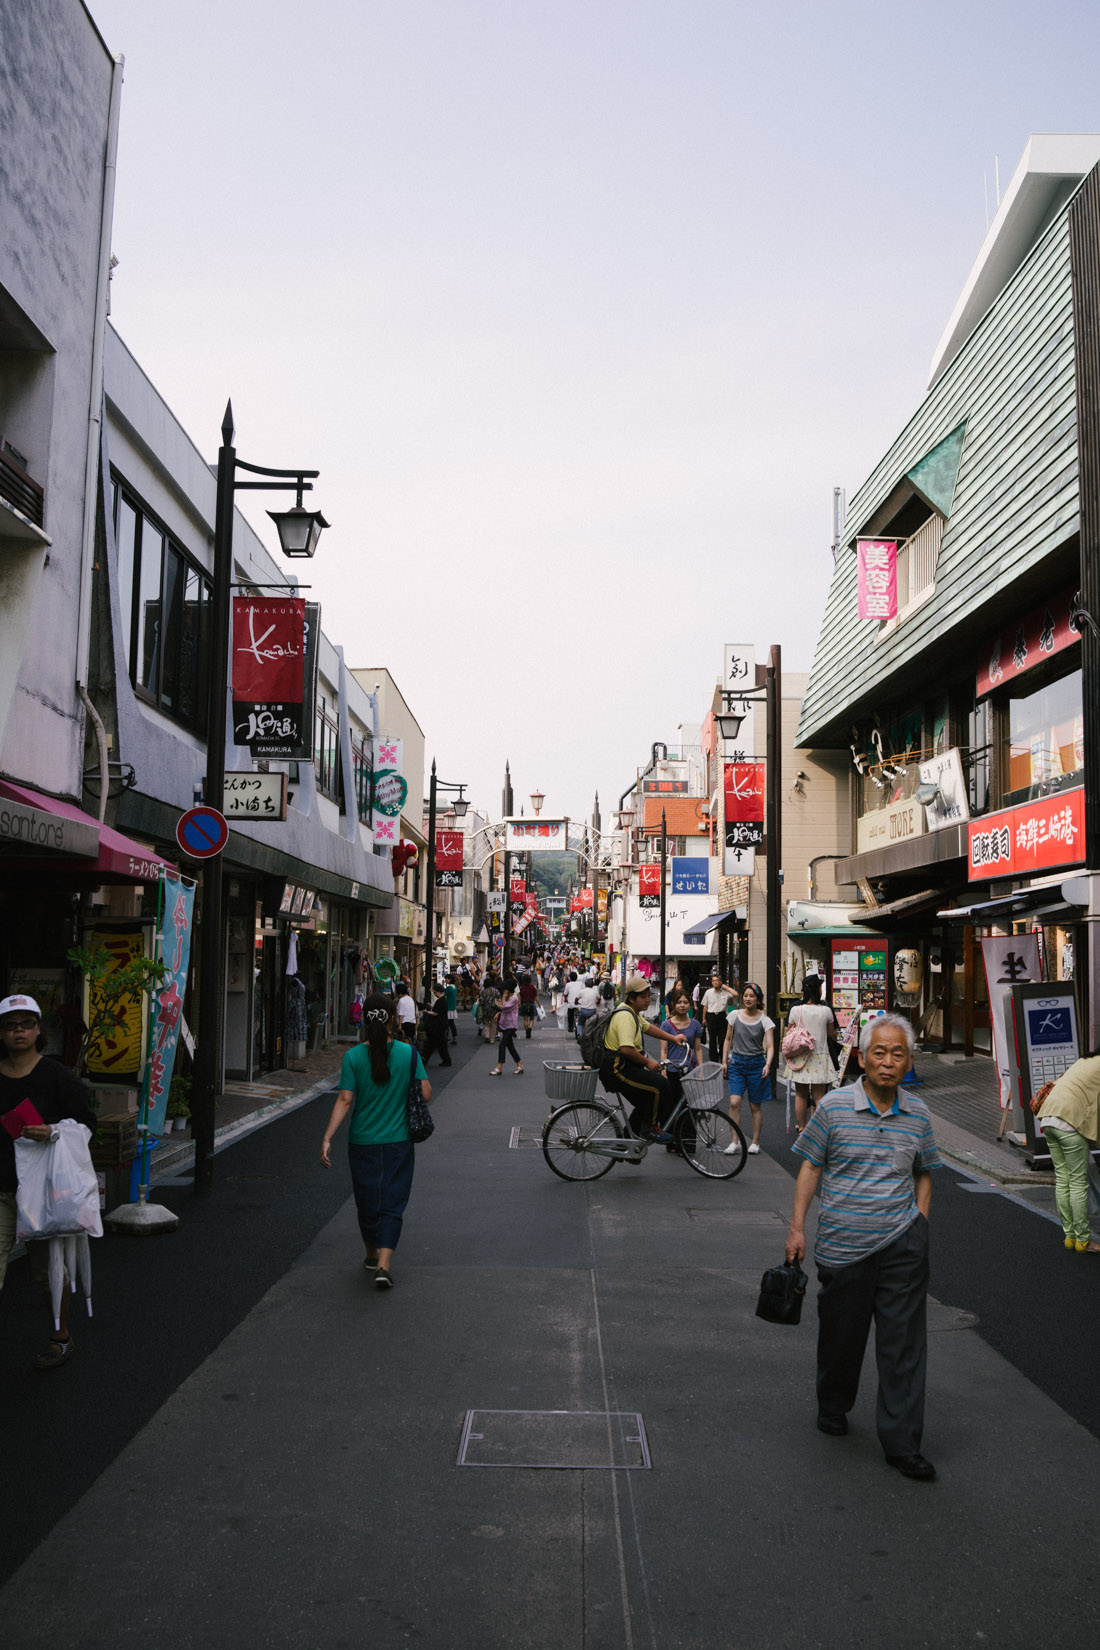 Shopping street in Kamakura, fantastic vibe!